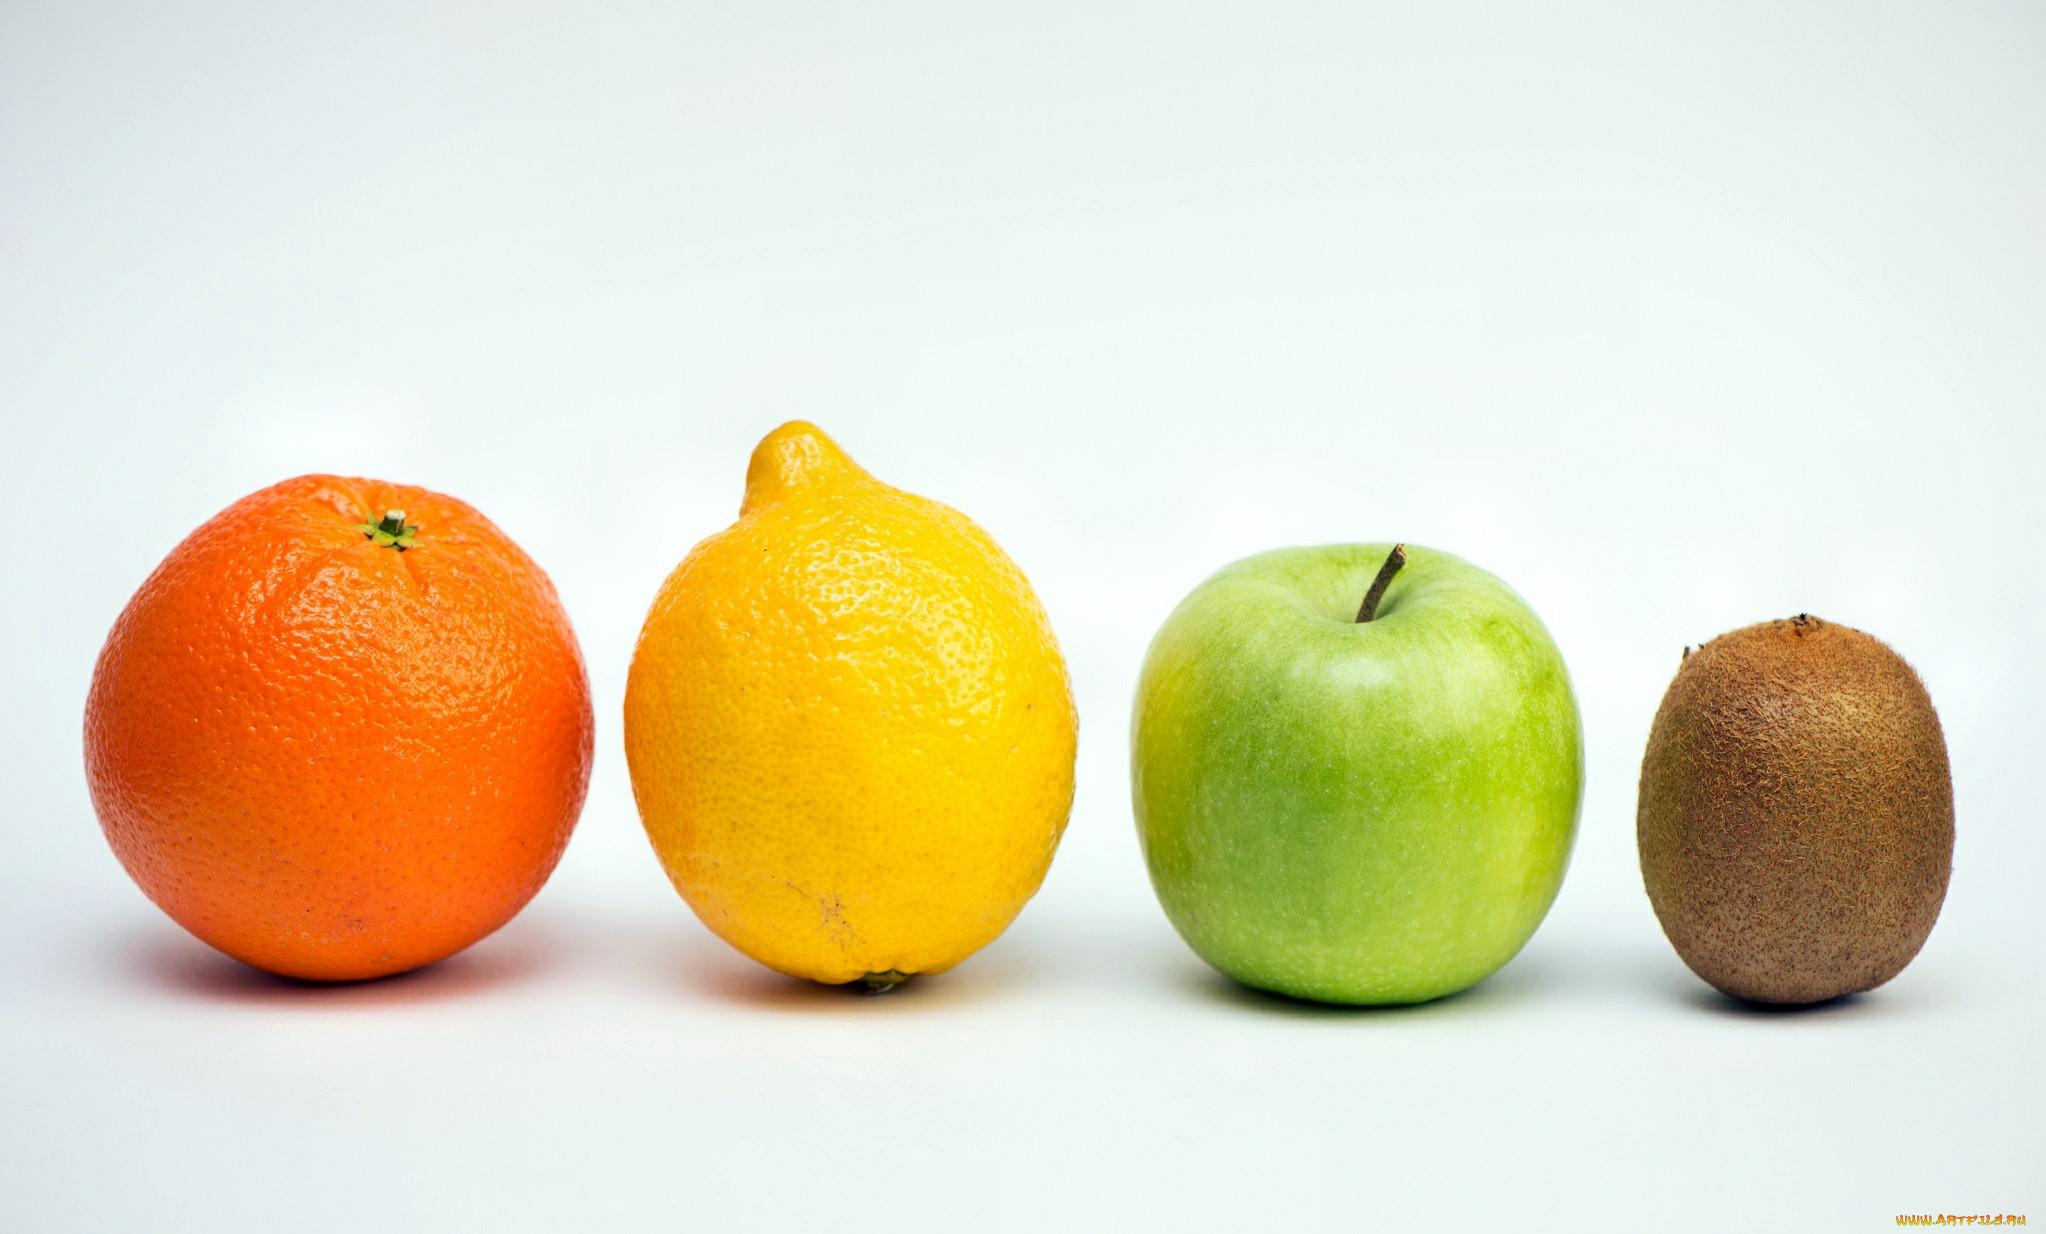 Яблоко груша апельсин лимон картинки